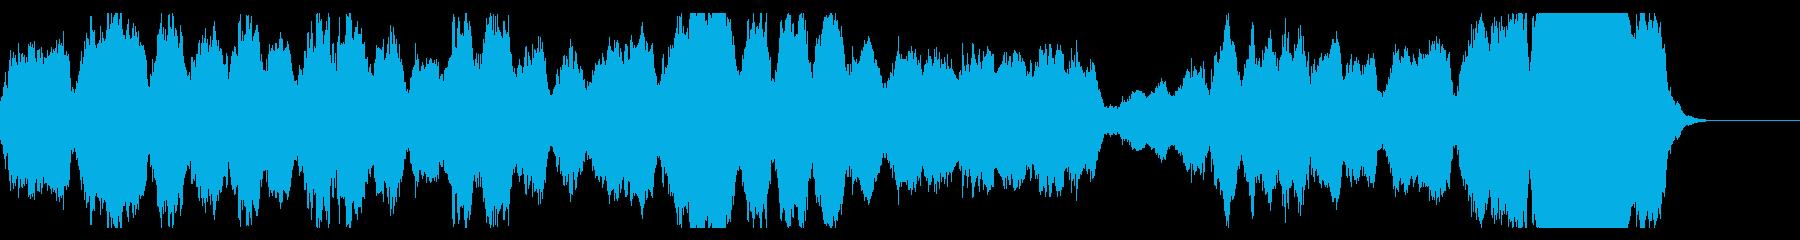 TVでよく使われるクラシック 展覧会の絵の再生済みの波形